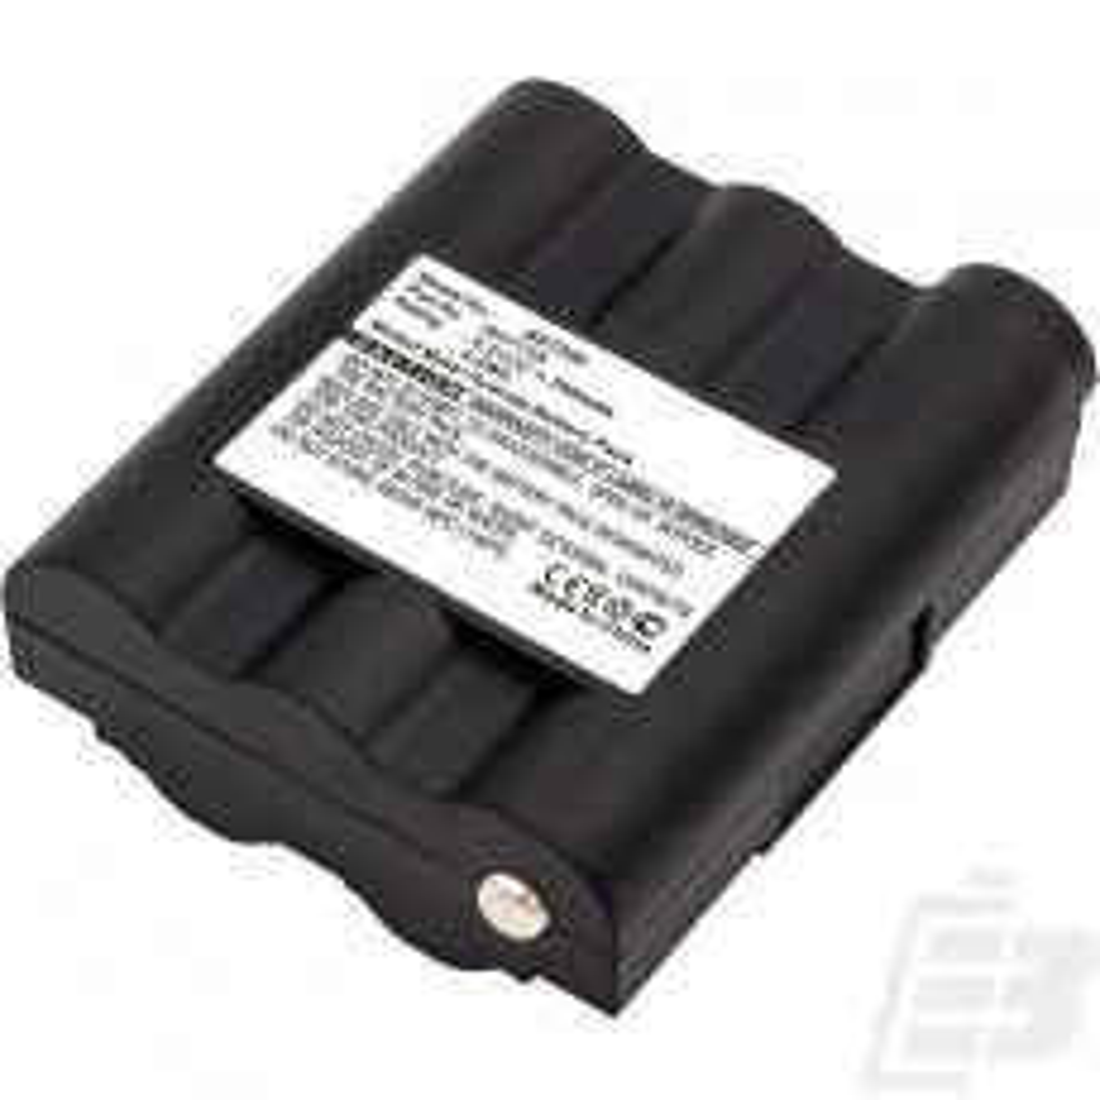 Two-Way radio battery Midland GTX300_1